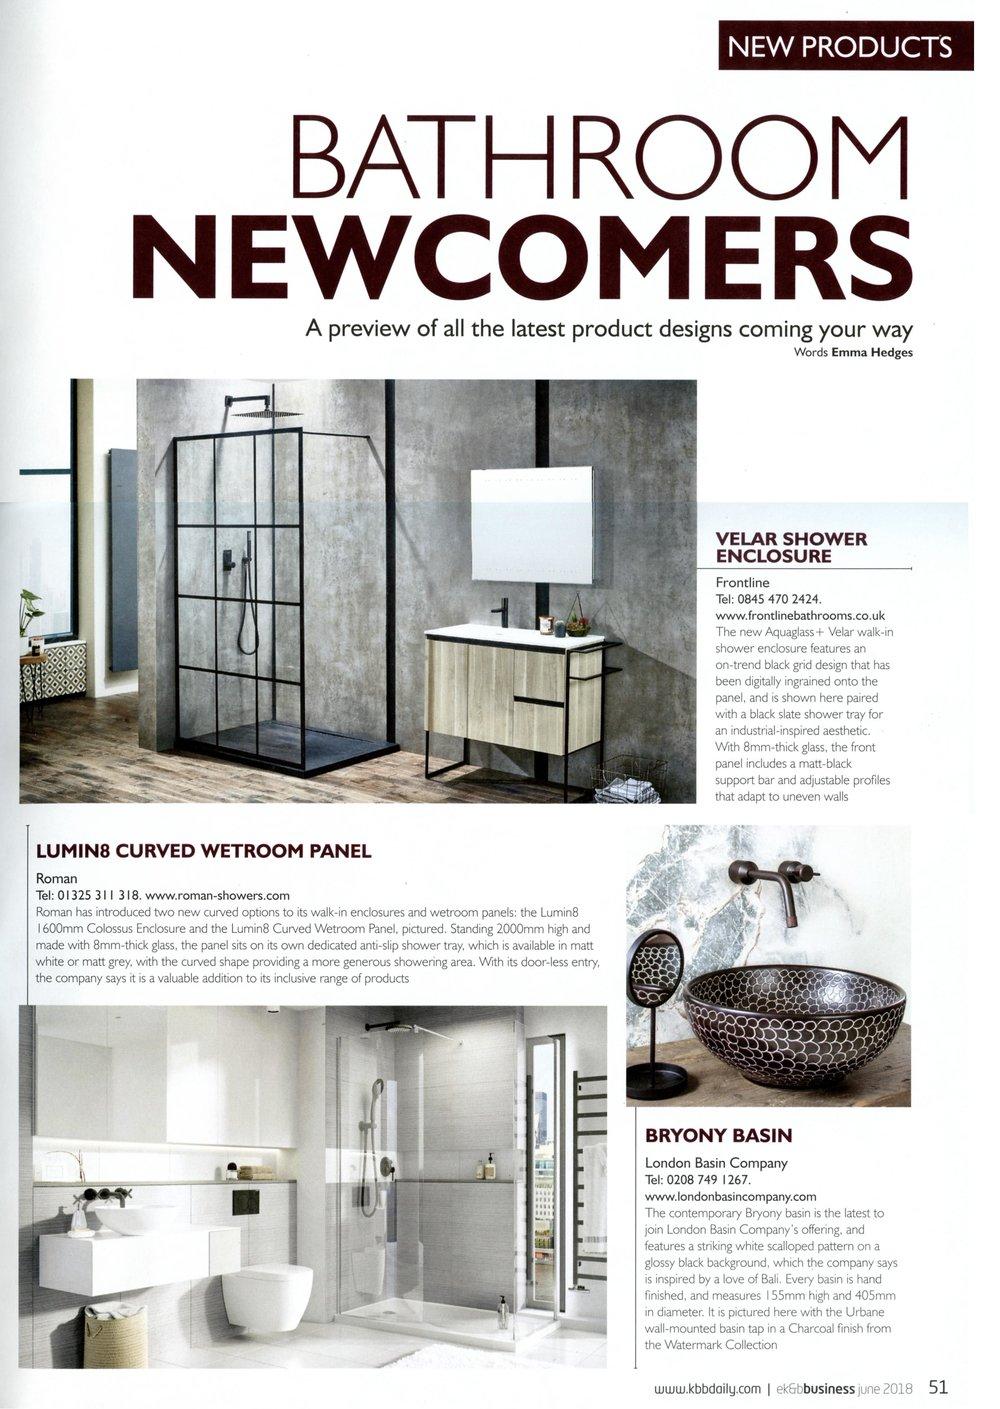 Essential kitchen & bathroom business June 2018 LBC.jpg